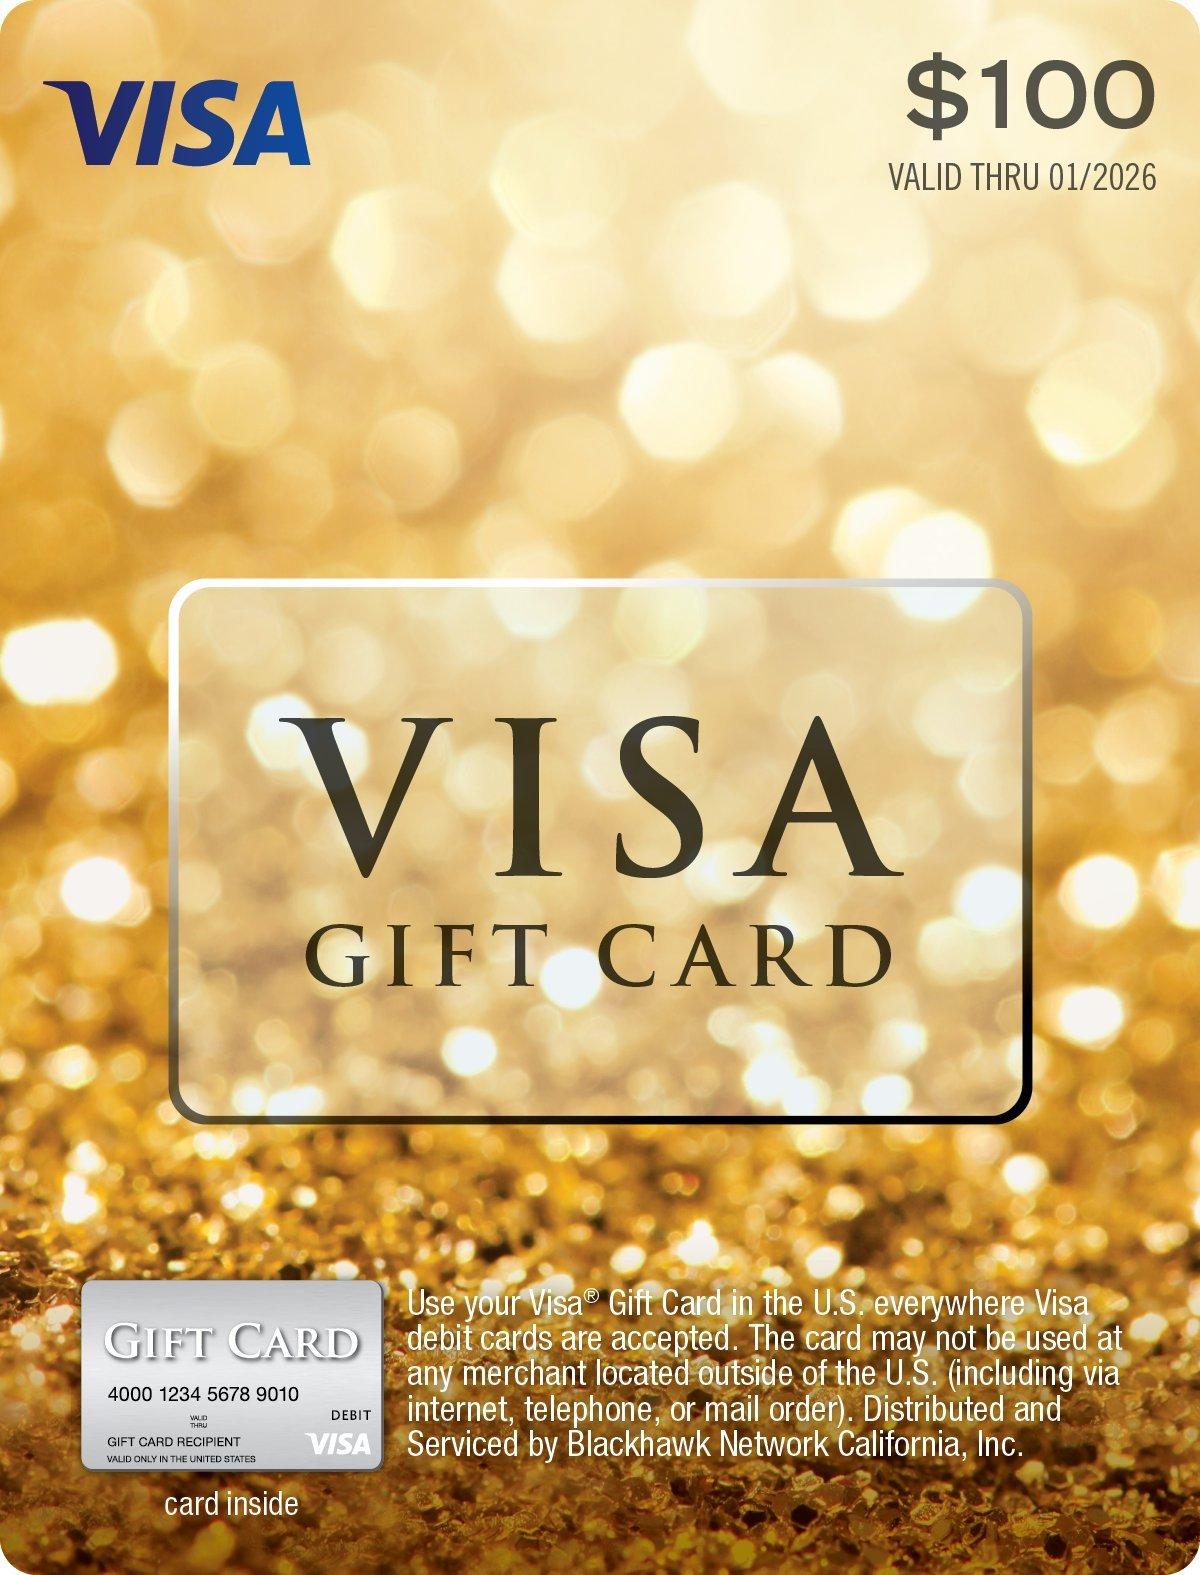 $11 Visa Gift Card (plus $11.911 Purchase Fee) - scorpioh.com